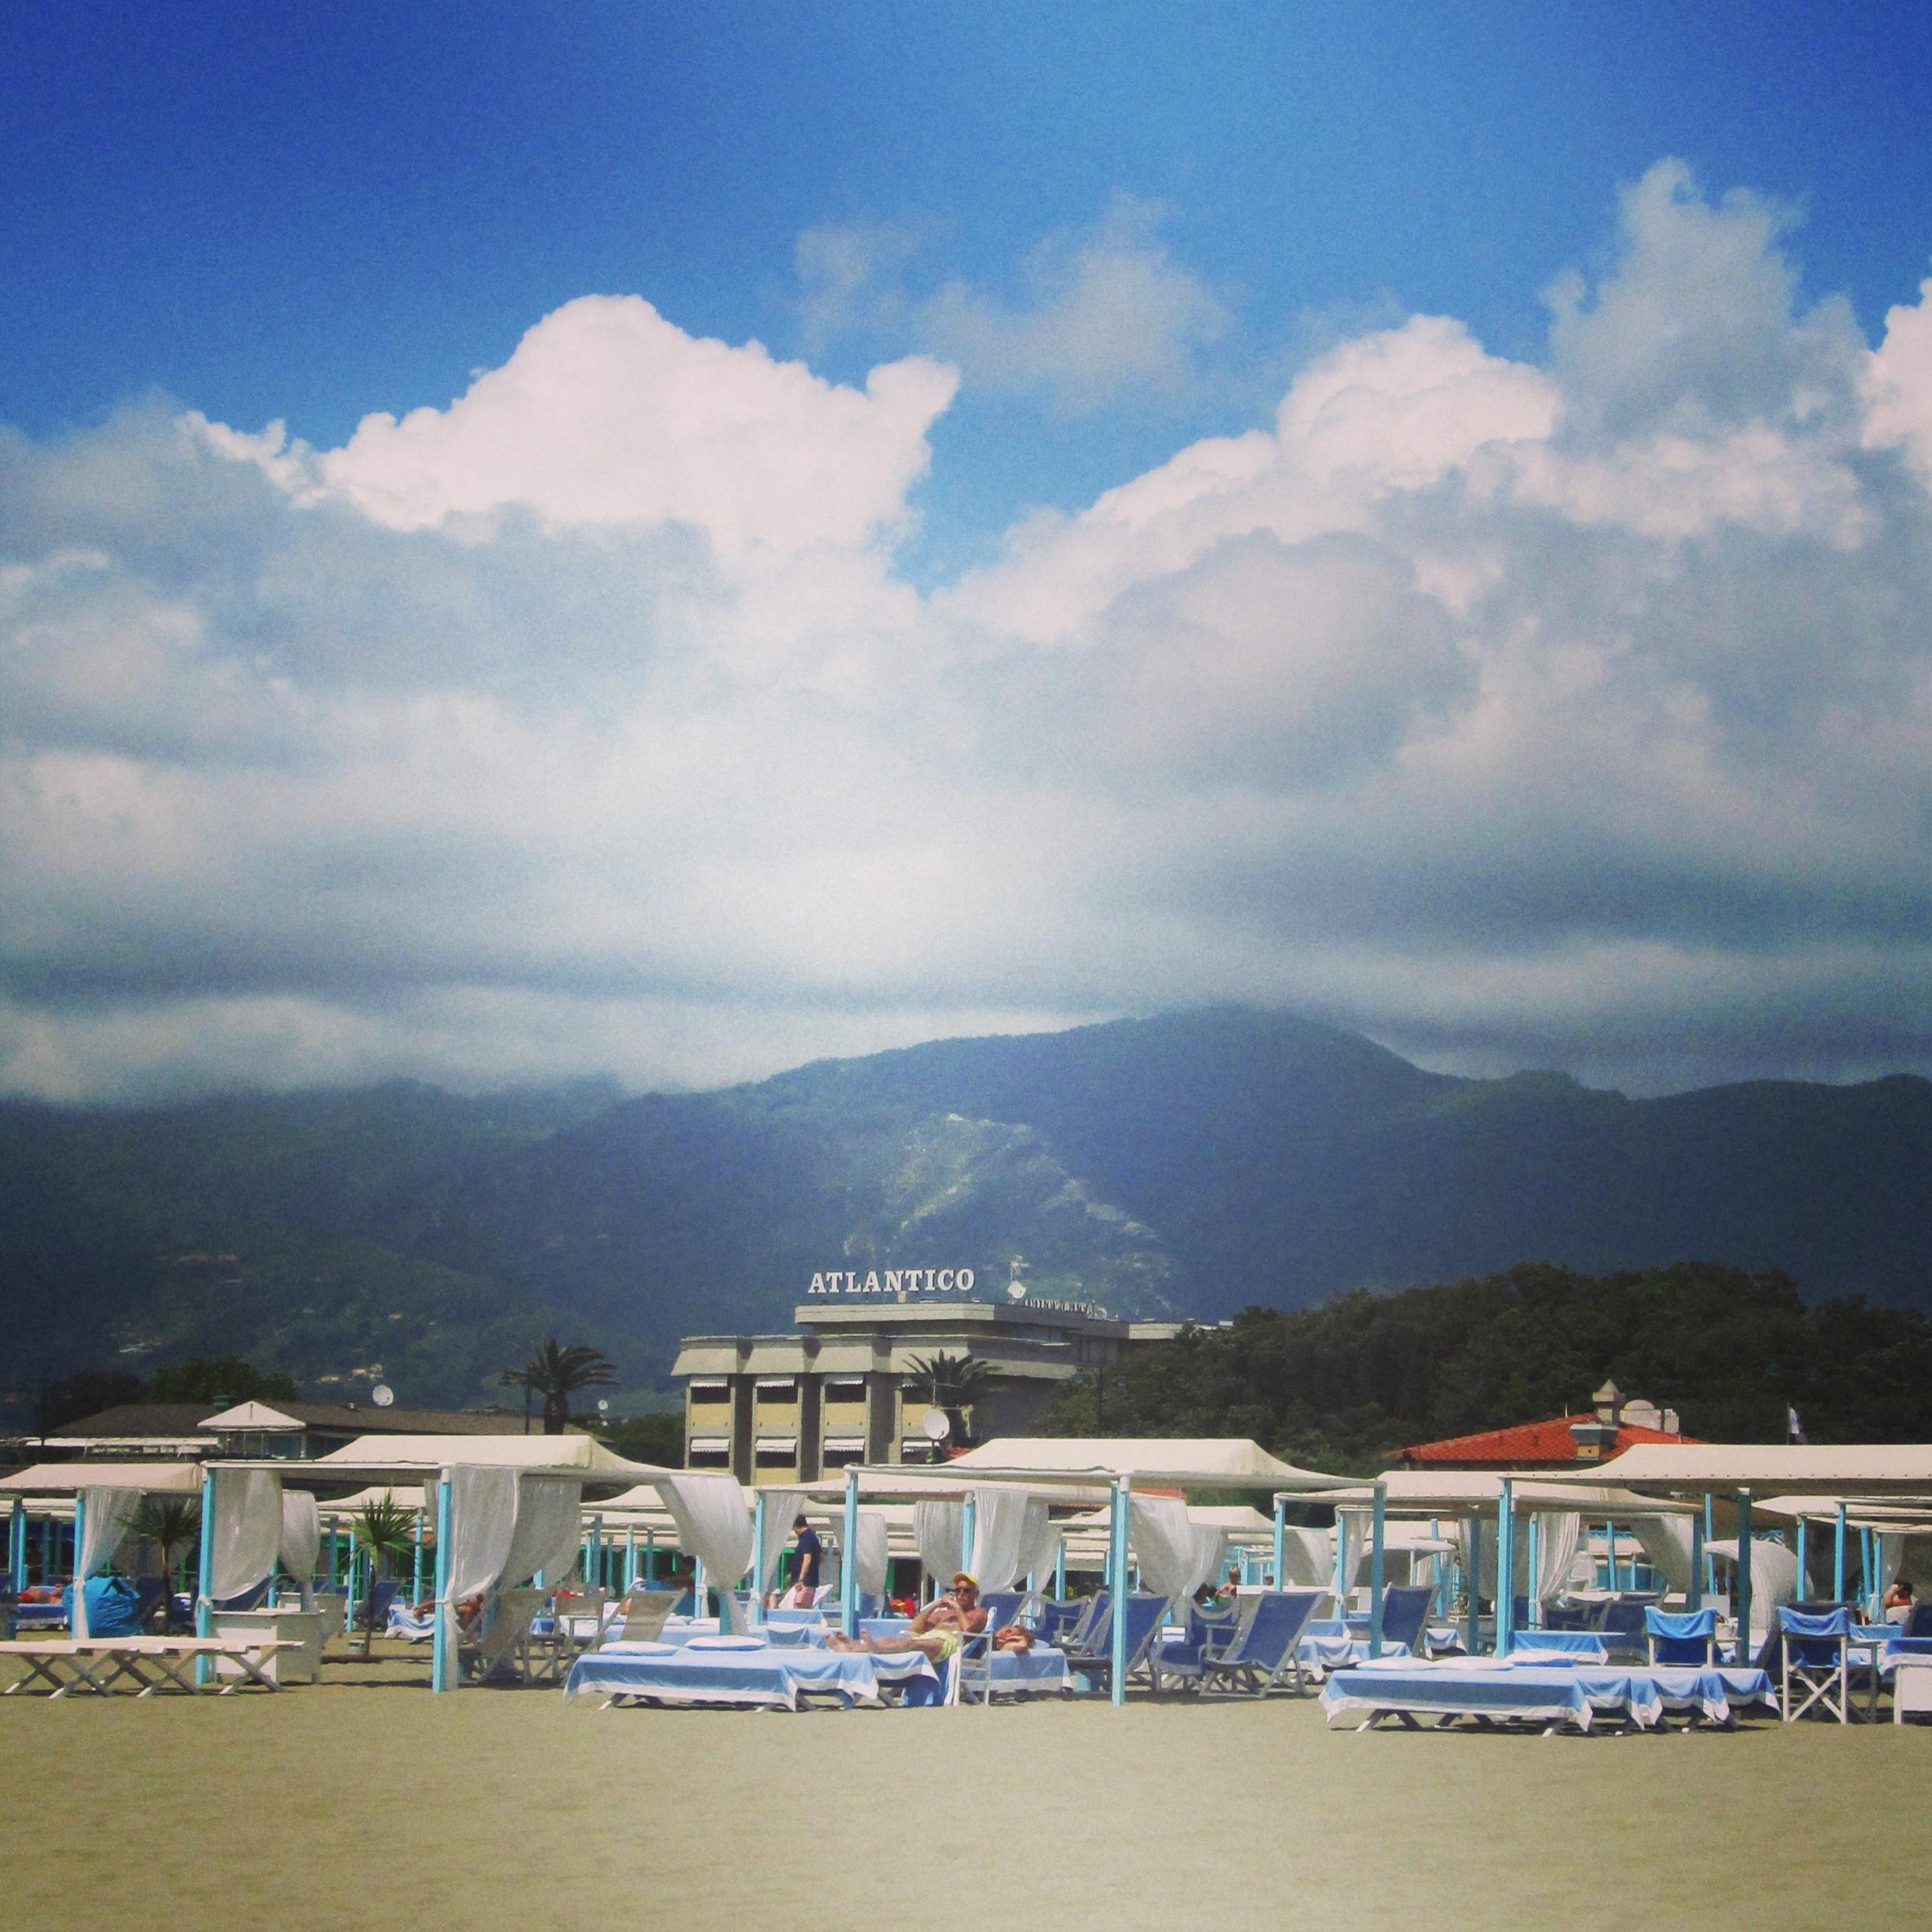 Vir e forte dei marmi et pietrasanta id e week end voyage toscane - Bagno annetta forte dei marmi ...